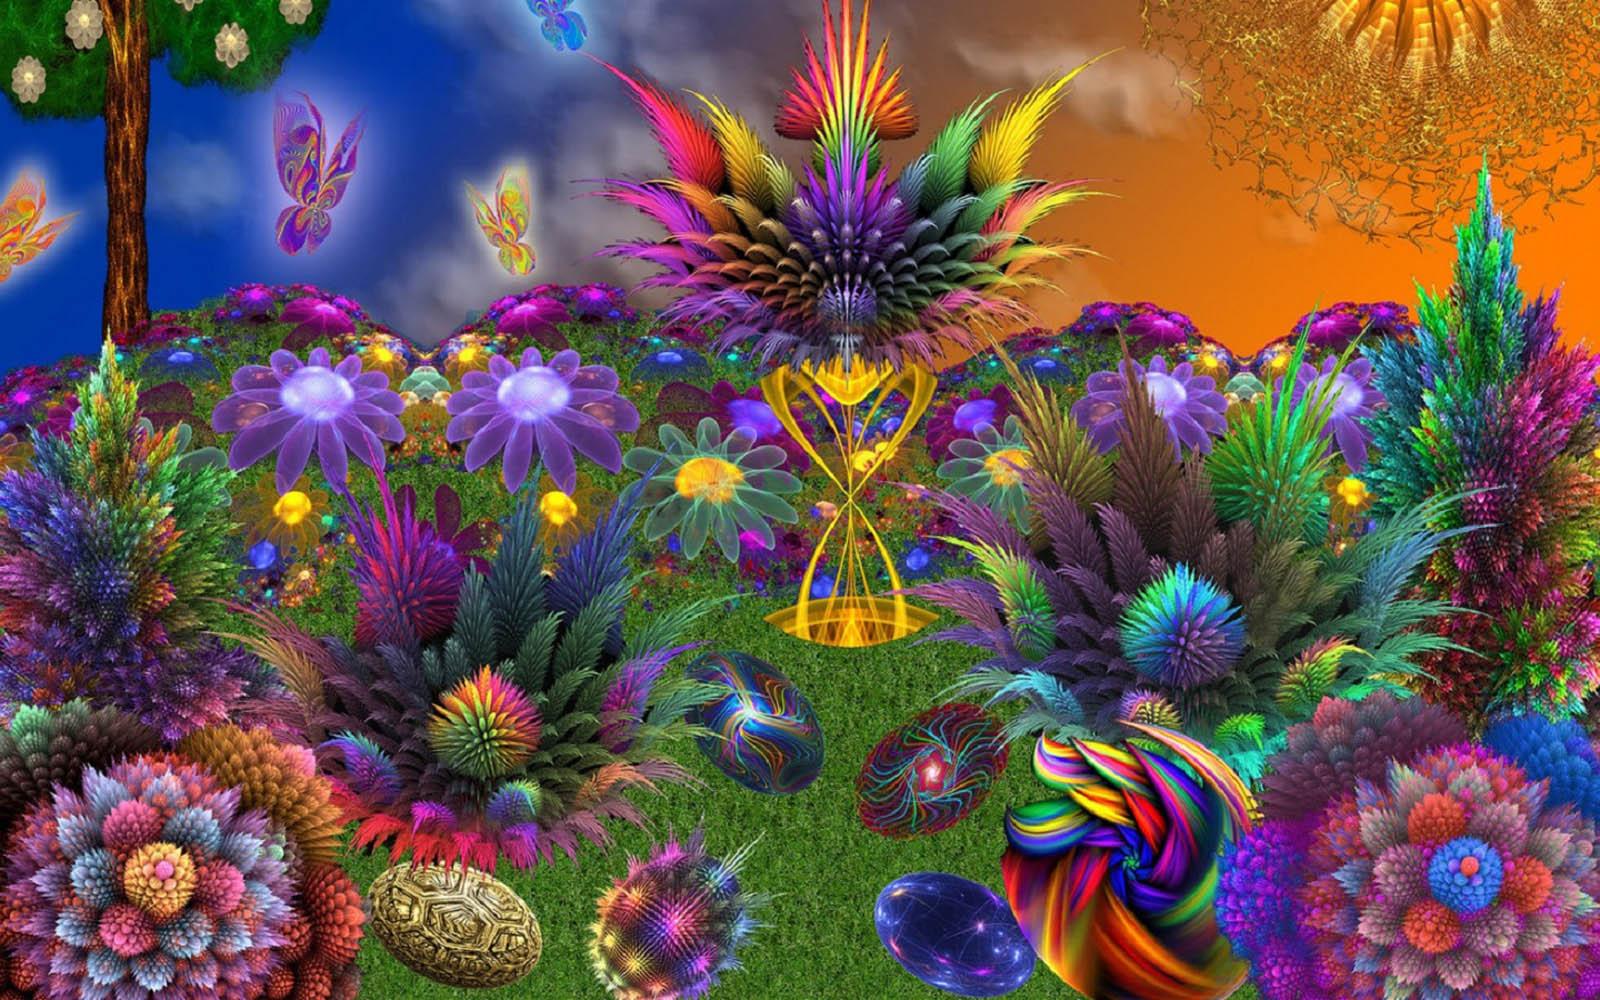 Floral Art Wallpaper Floral Art DesktopWallpaper Floral Art Desktop 1600x1000